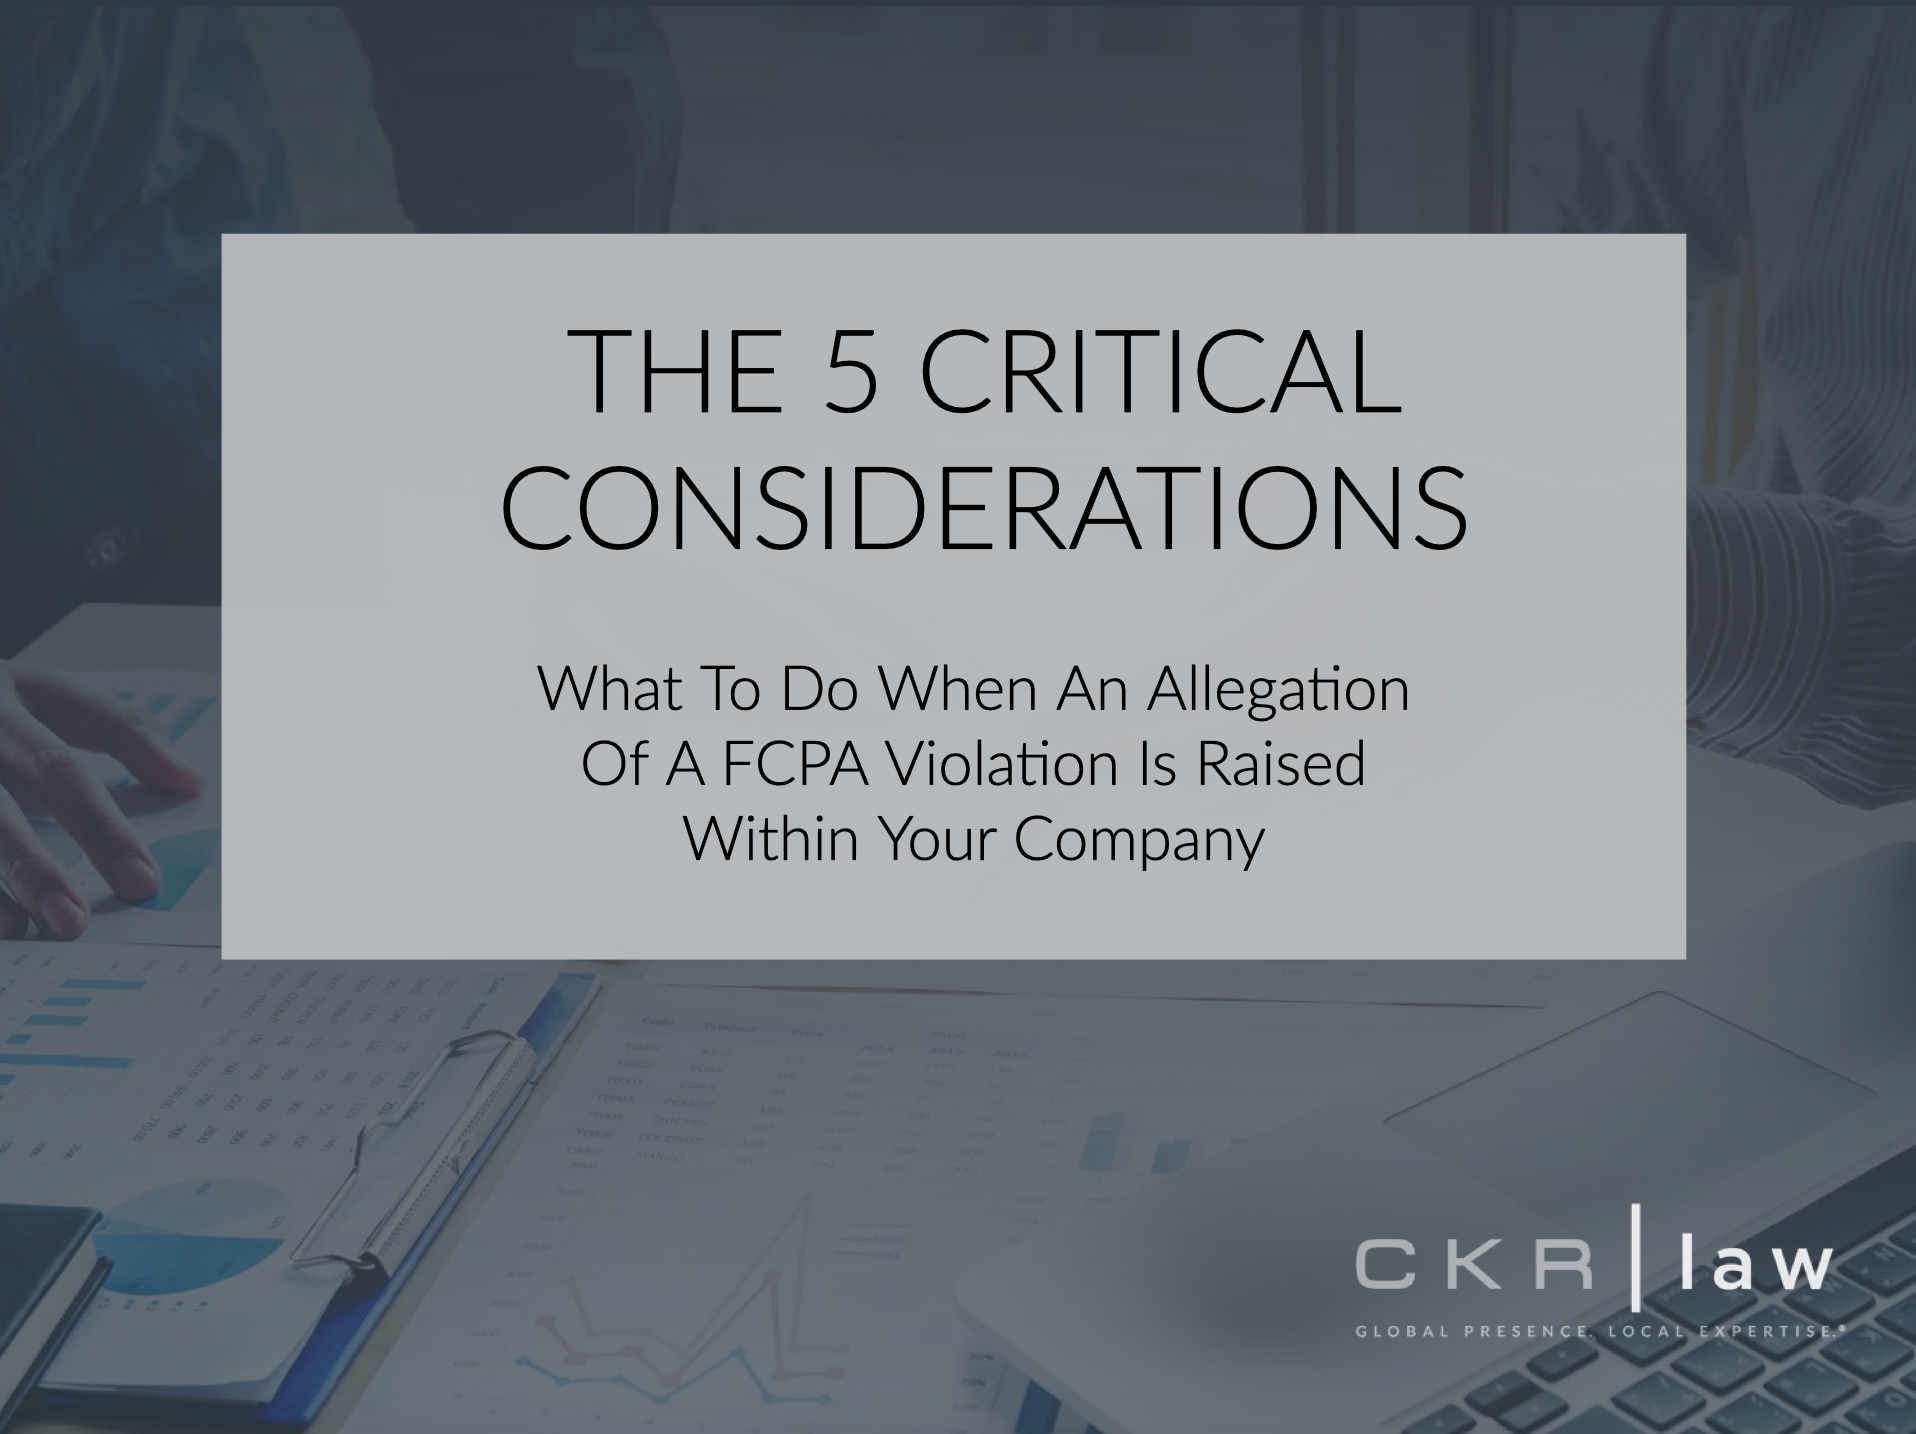 CKR Law presentation